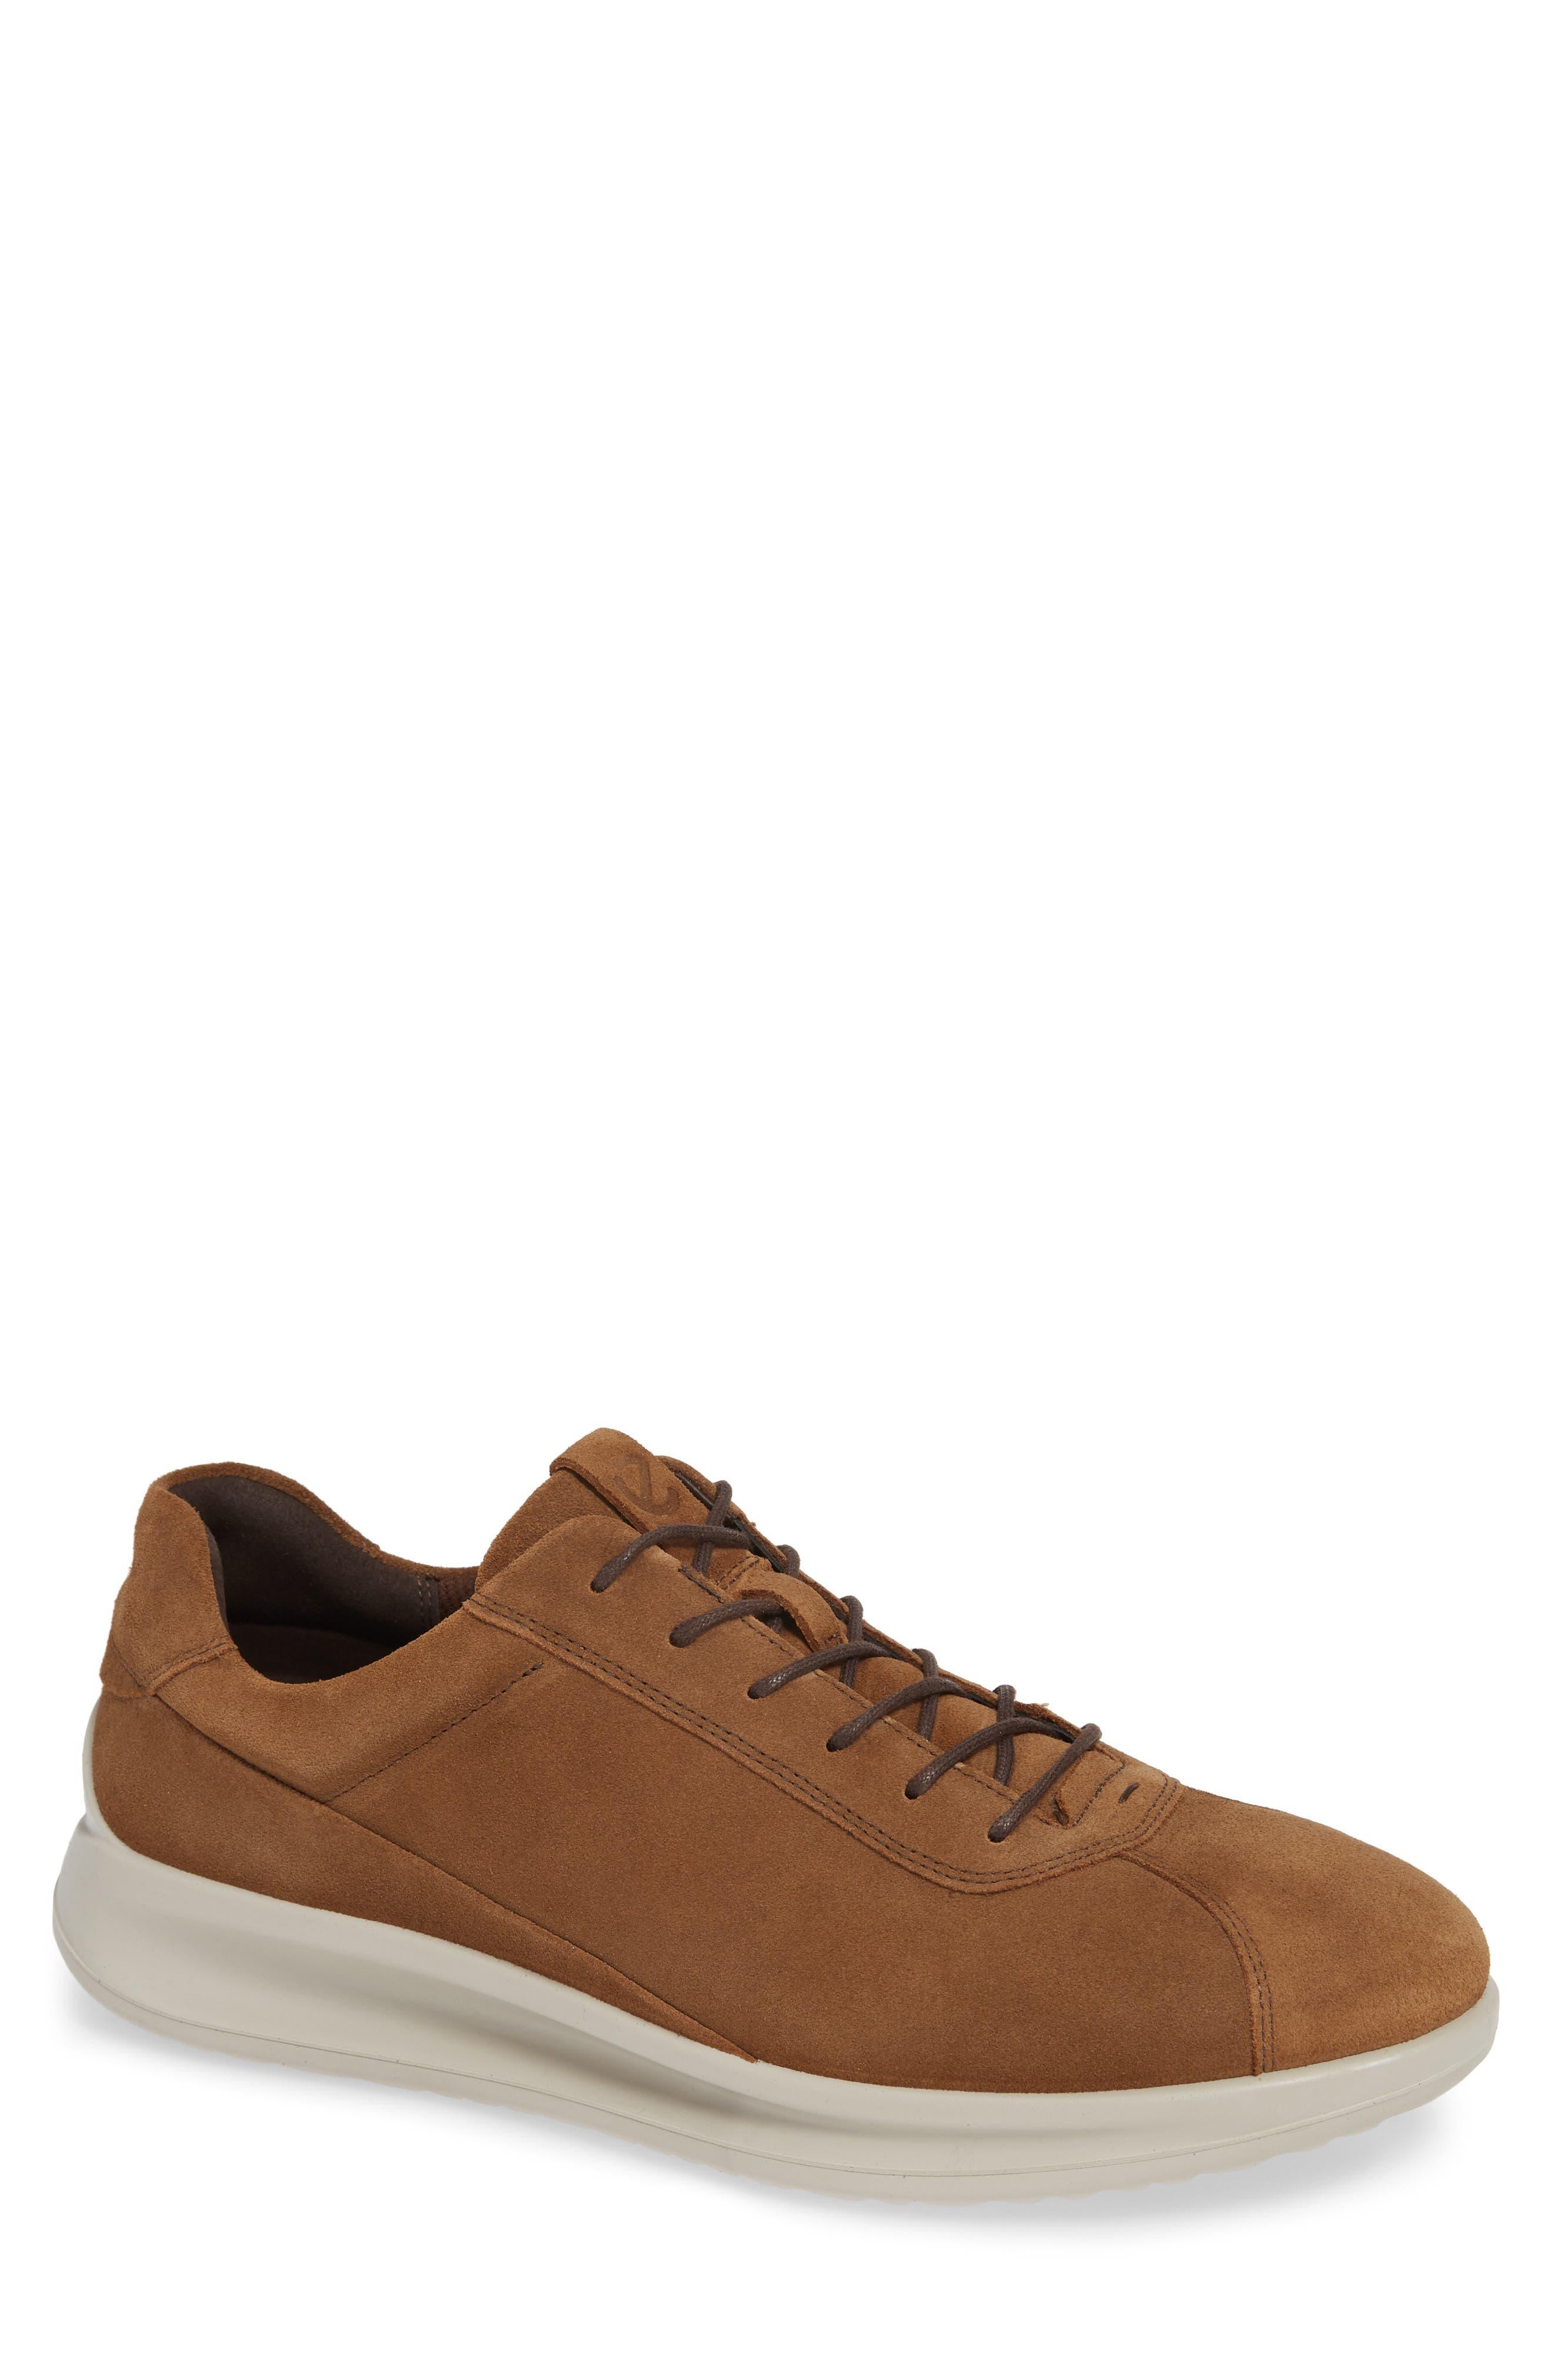 Vitrus Aquet Sneaker,                             Main thumbnail 1, color,                             204